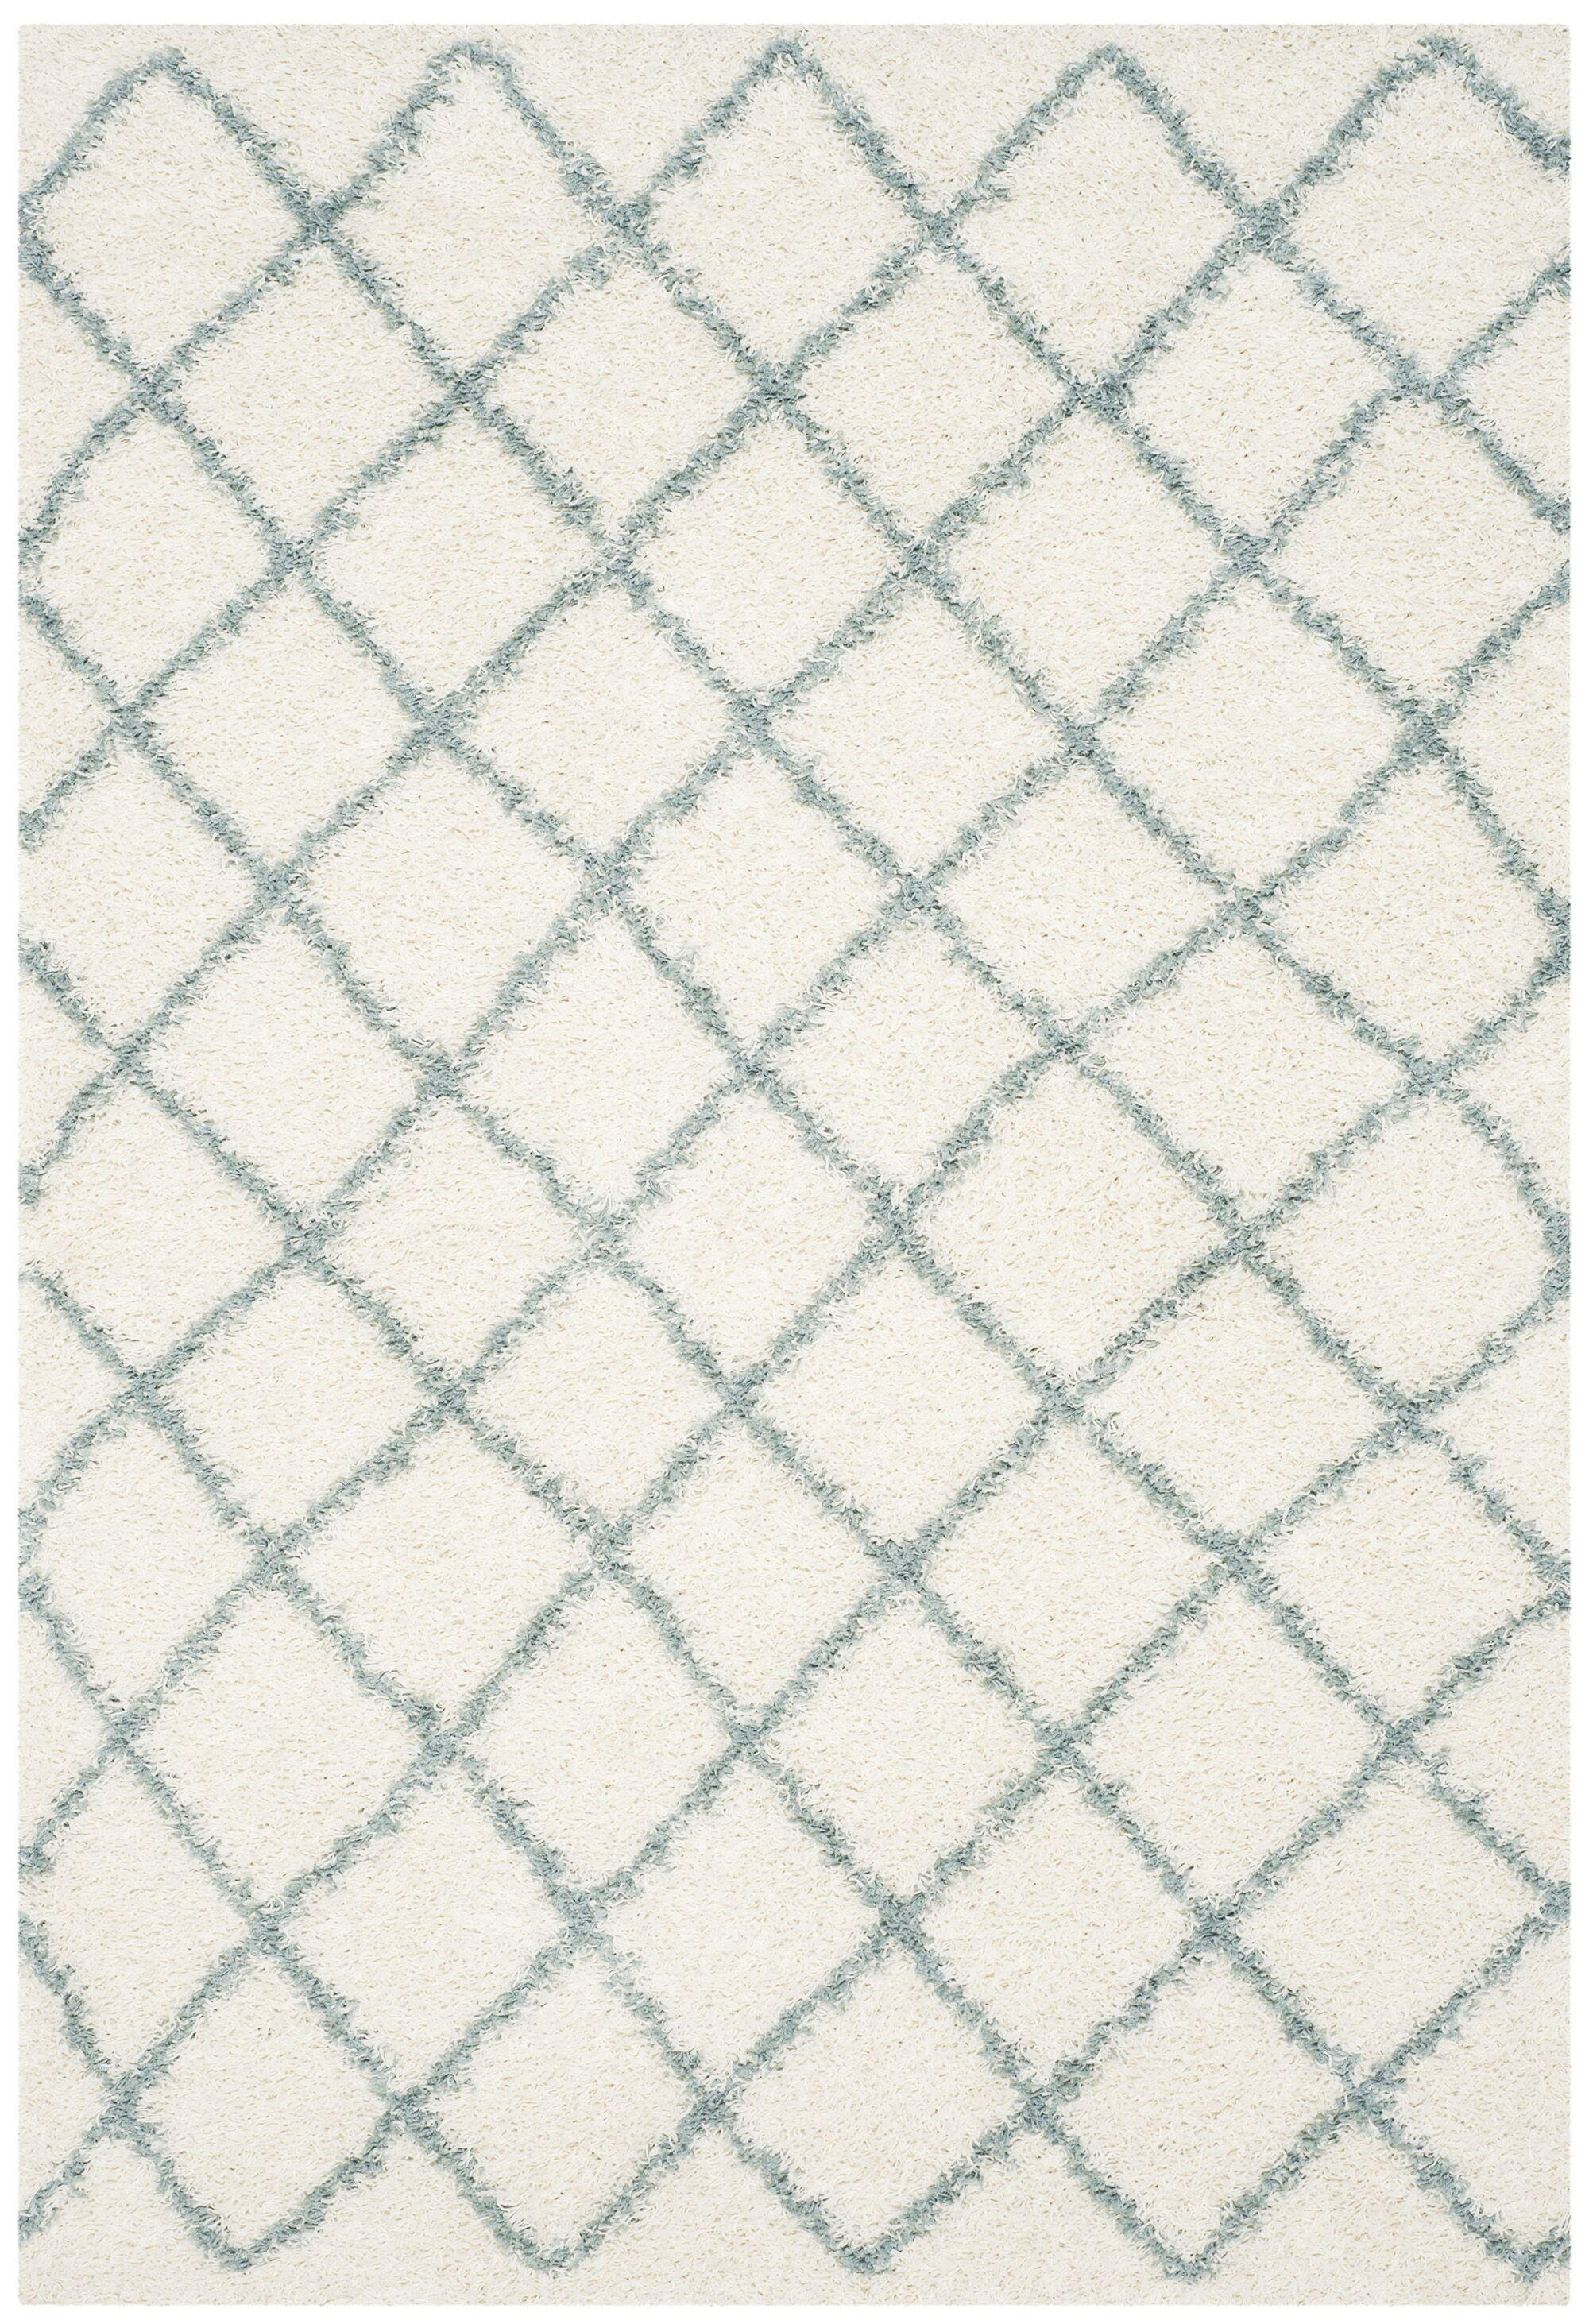 Pate Ivory / Seafoam Area Rug Rug Size: Rectangle 6' x 9'